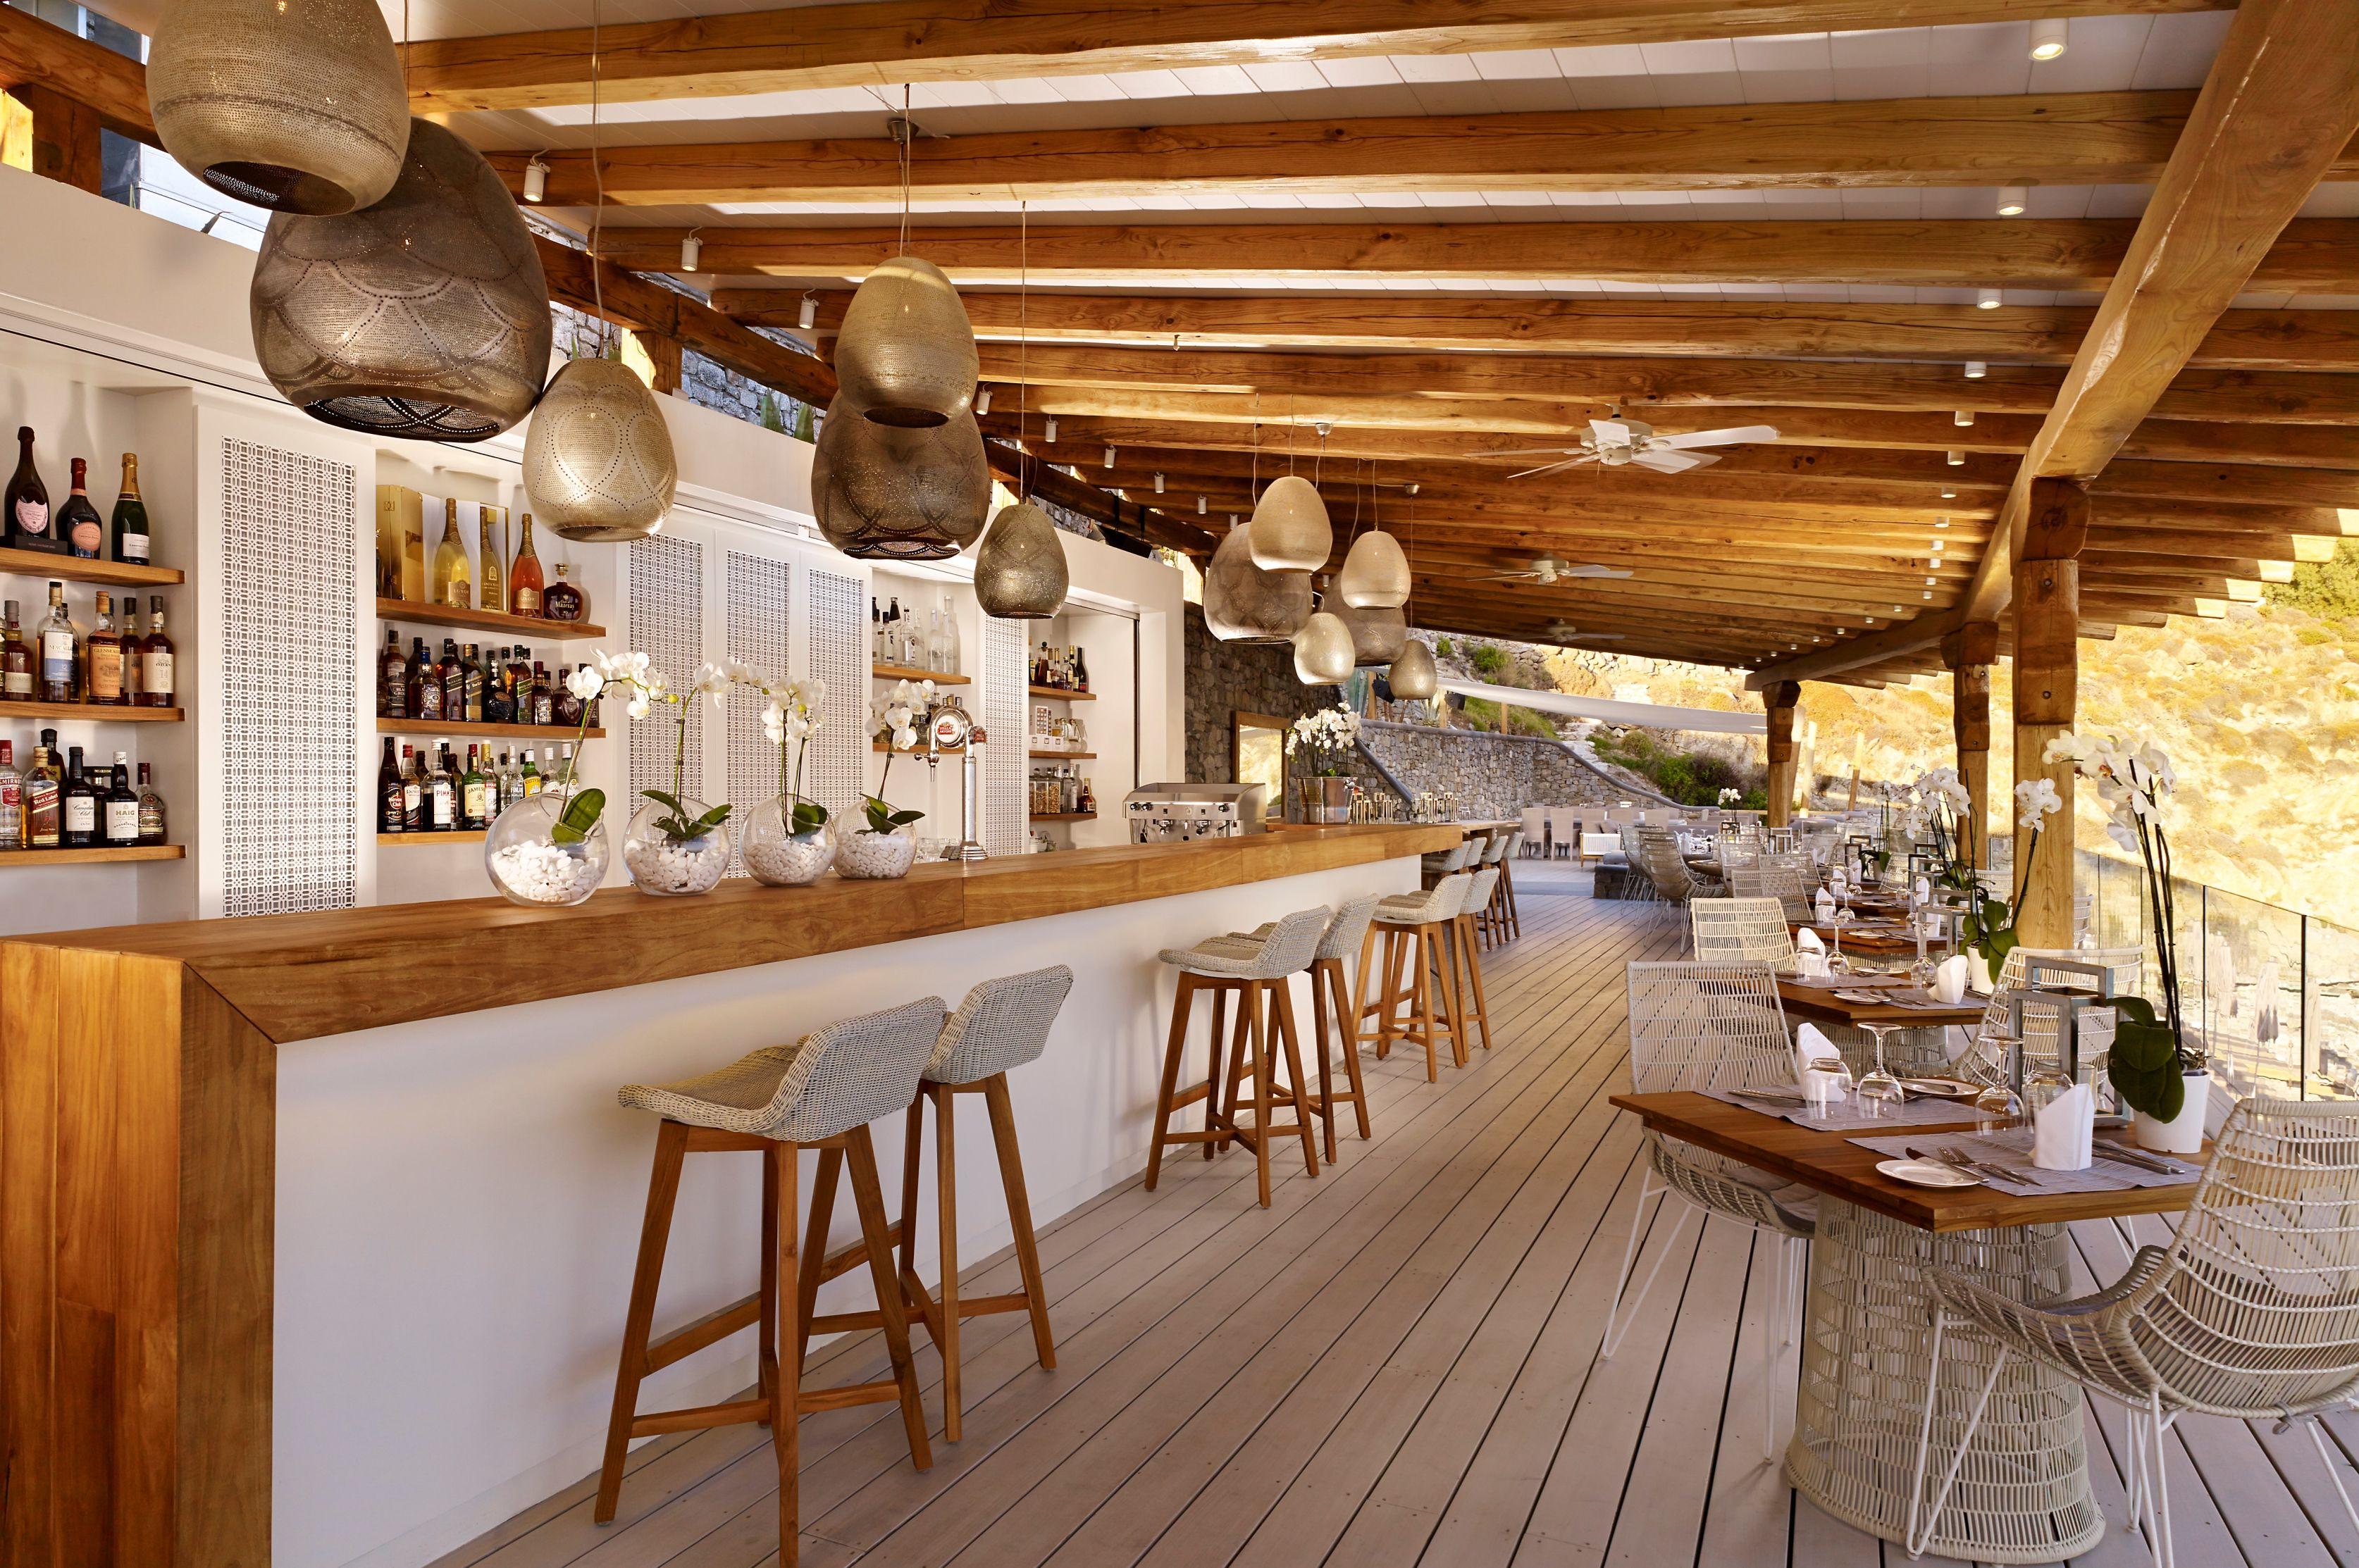 pop up bar - Buscar con Google | Restaurants (to-go list ...